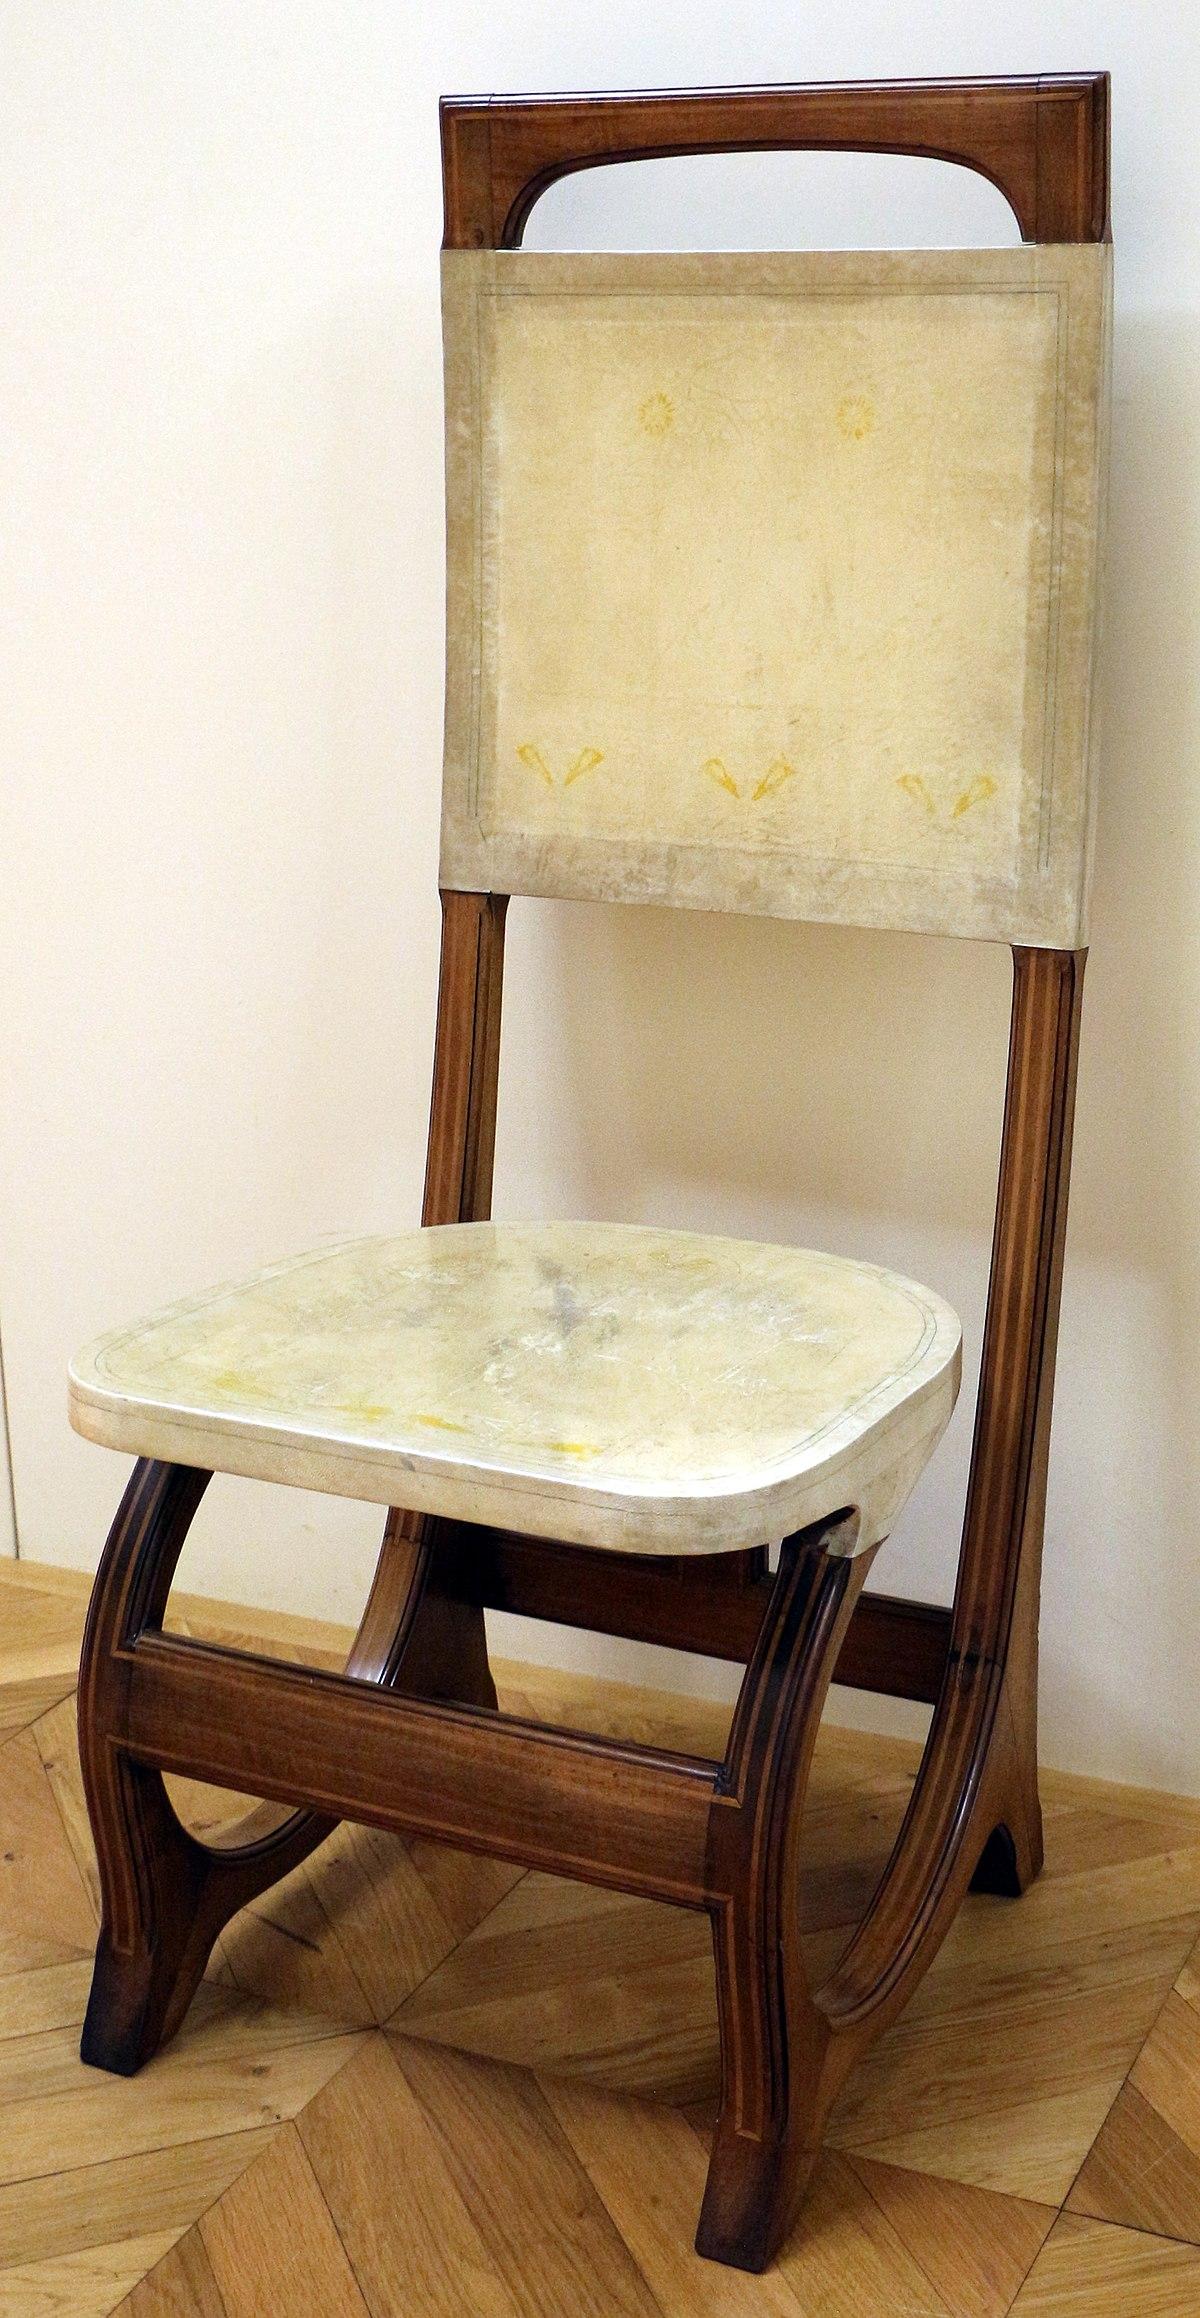 File:Carlo bugatti, coppia di sedie da sala da pranzo, 1904 ...